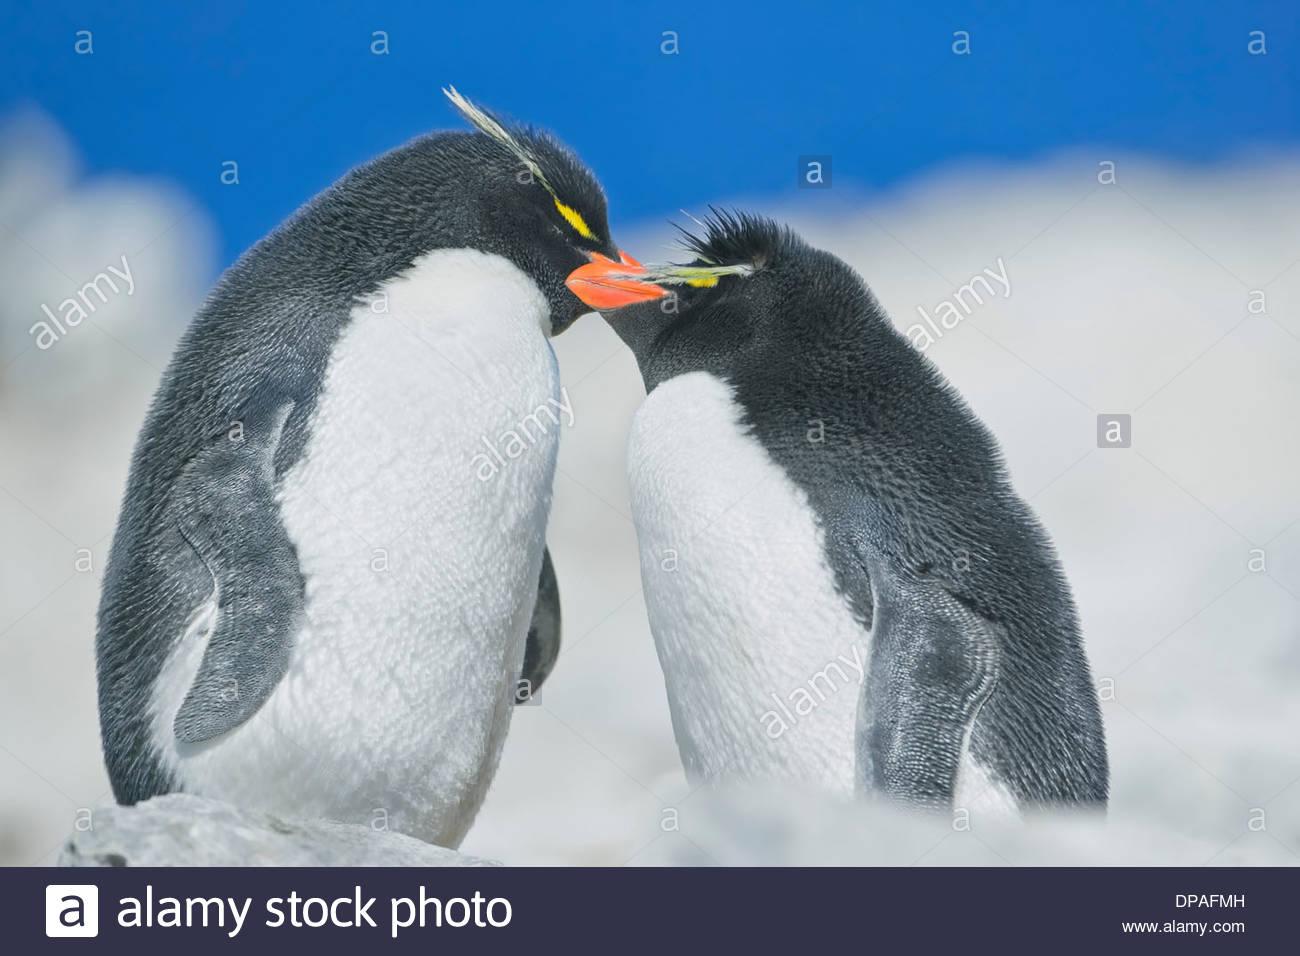 Zwei Rockhopper Penguins (Eudyptes Chrysocome Chrysocome) eine liebevolle Stimmung, Falkland-Inseln Stockbild